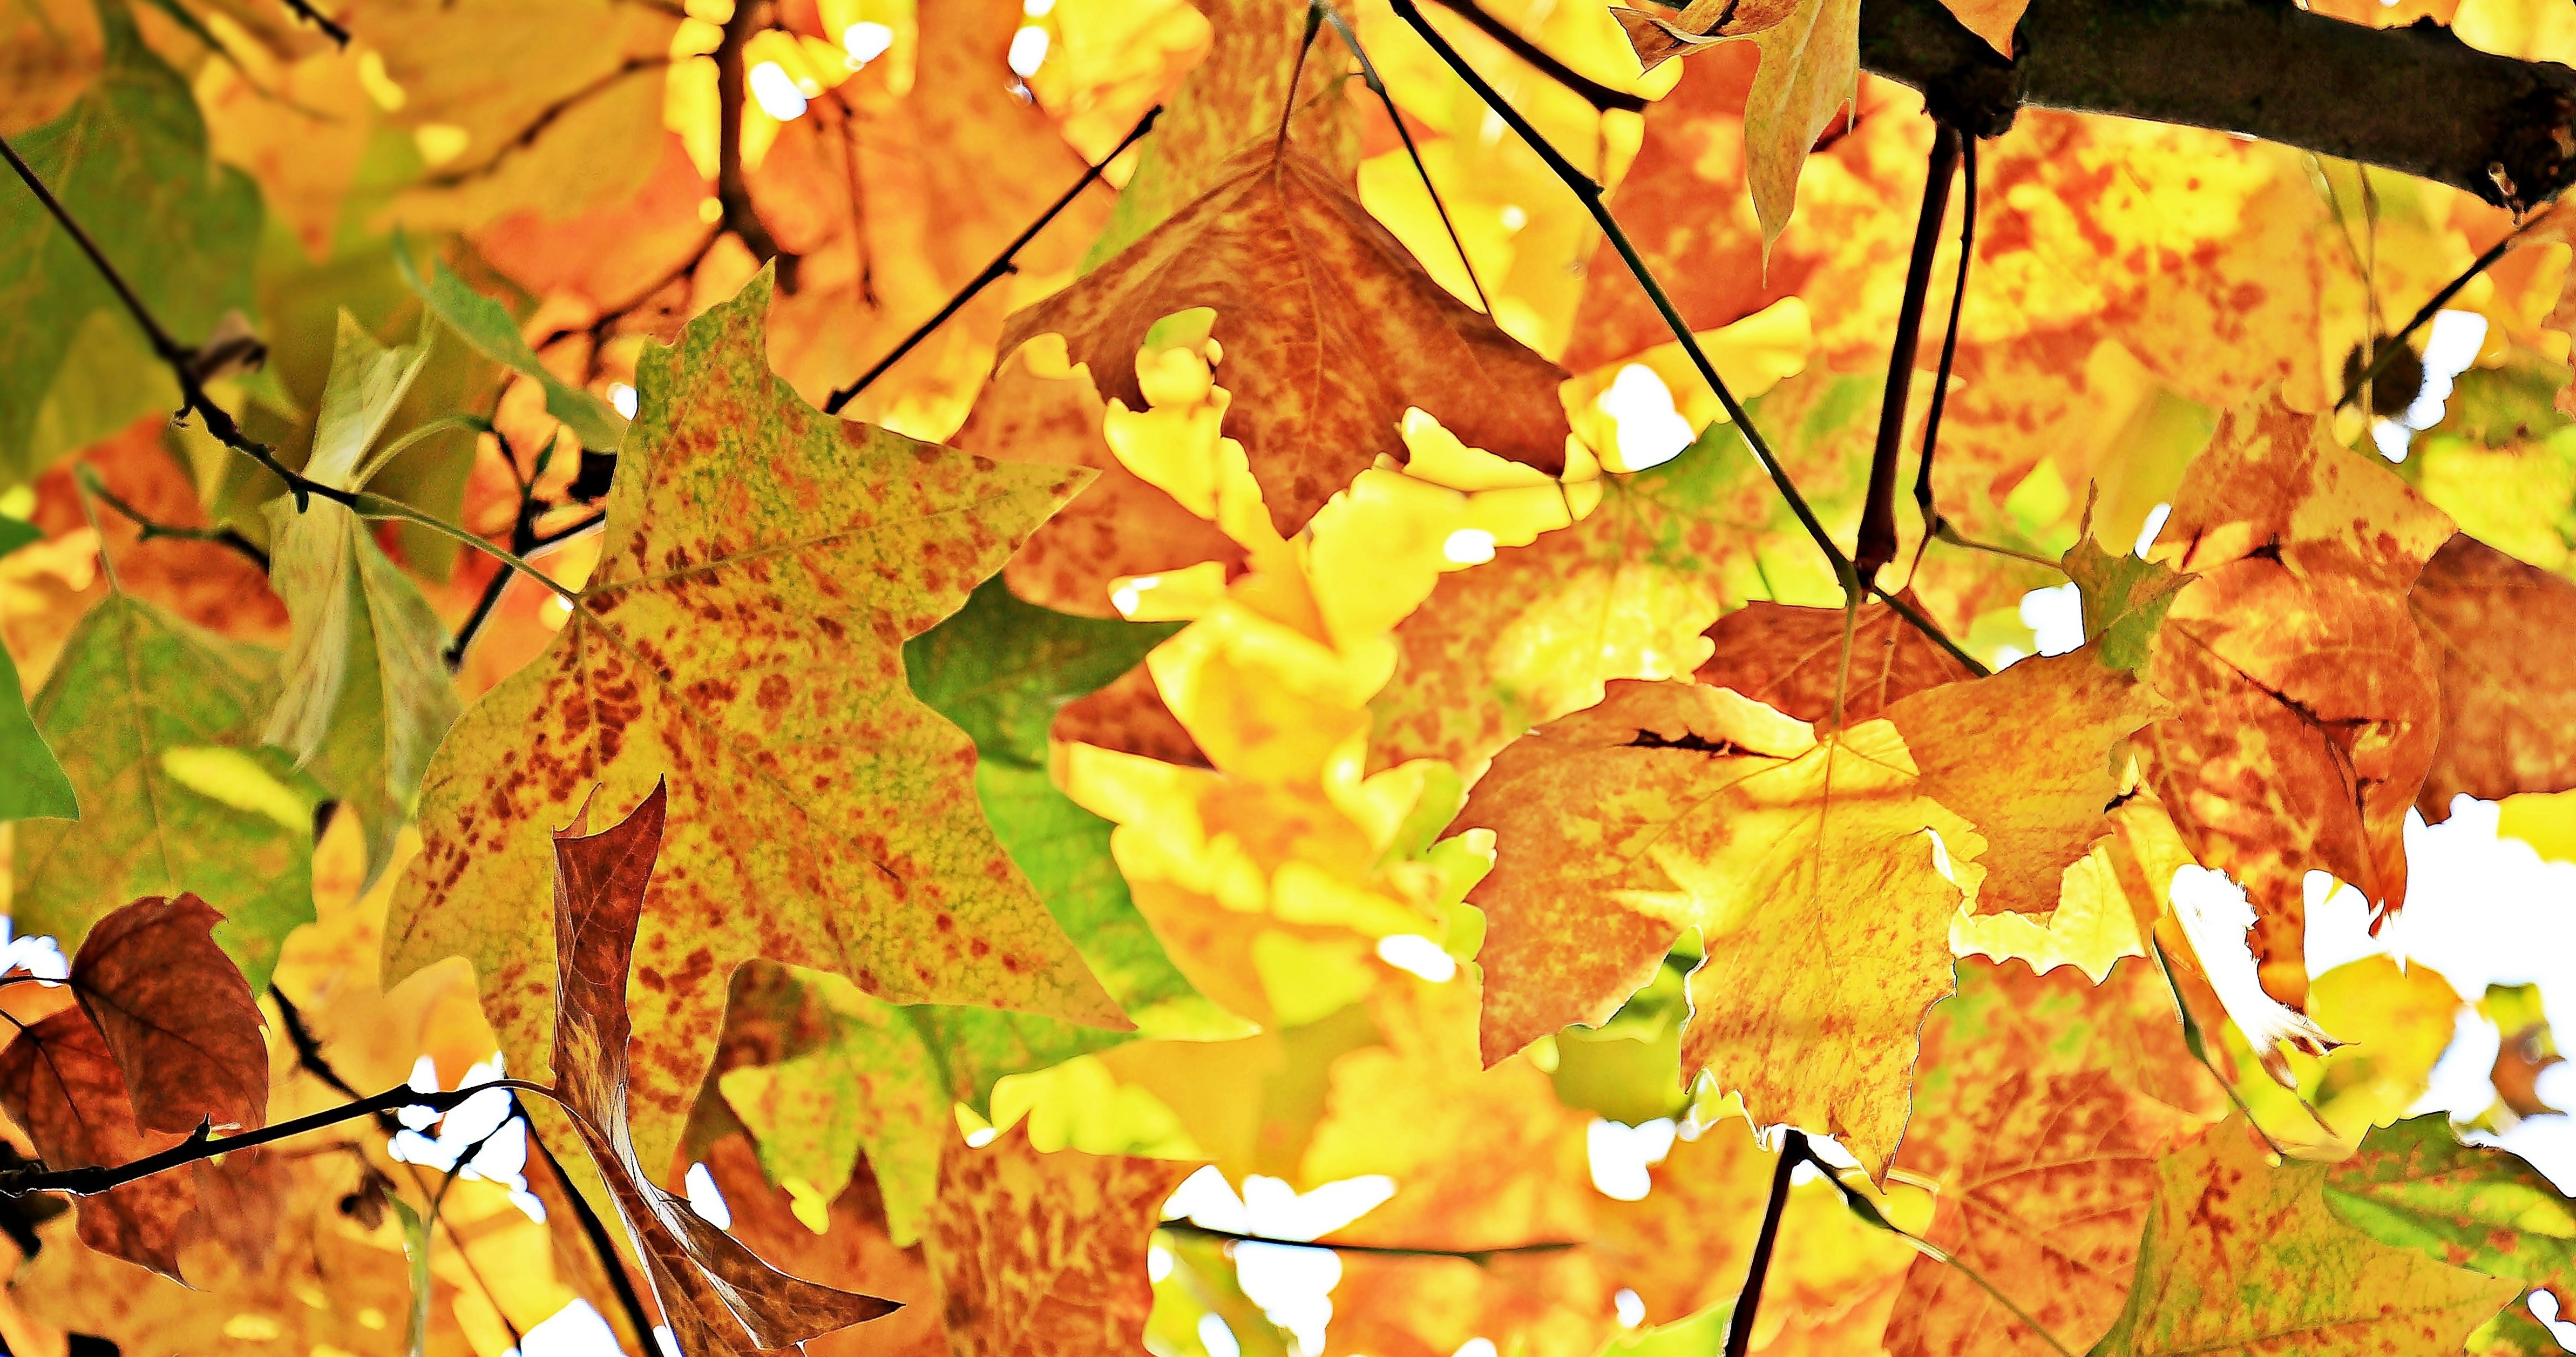 Autumn leaf vase